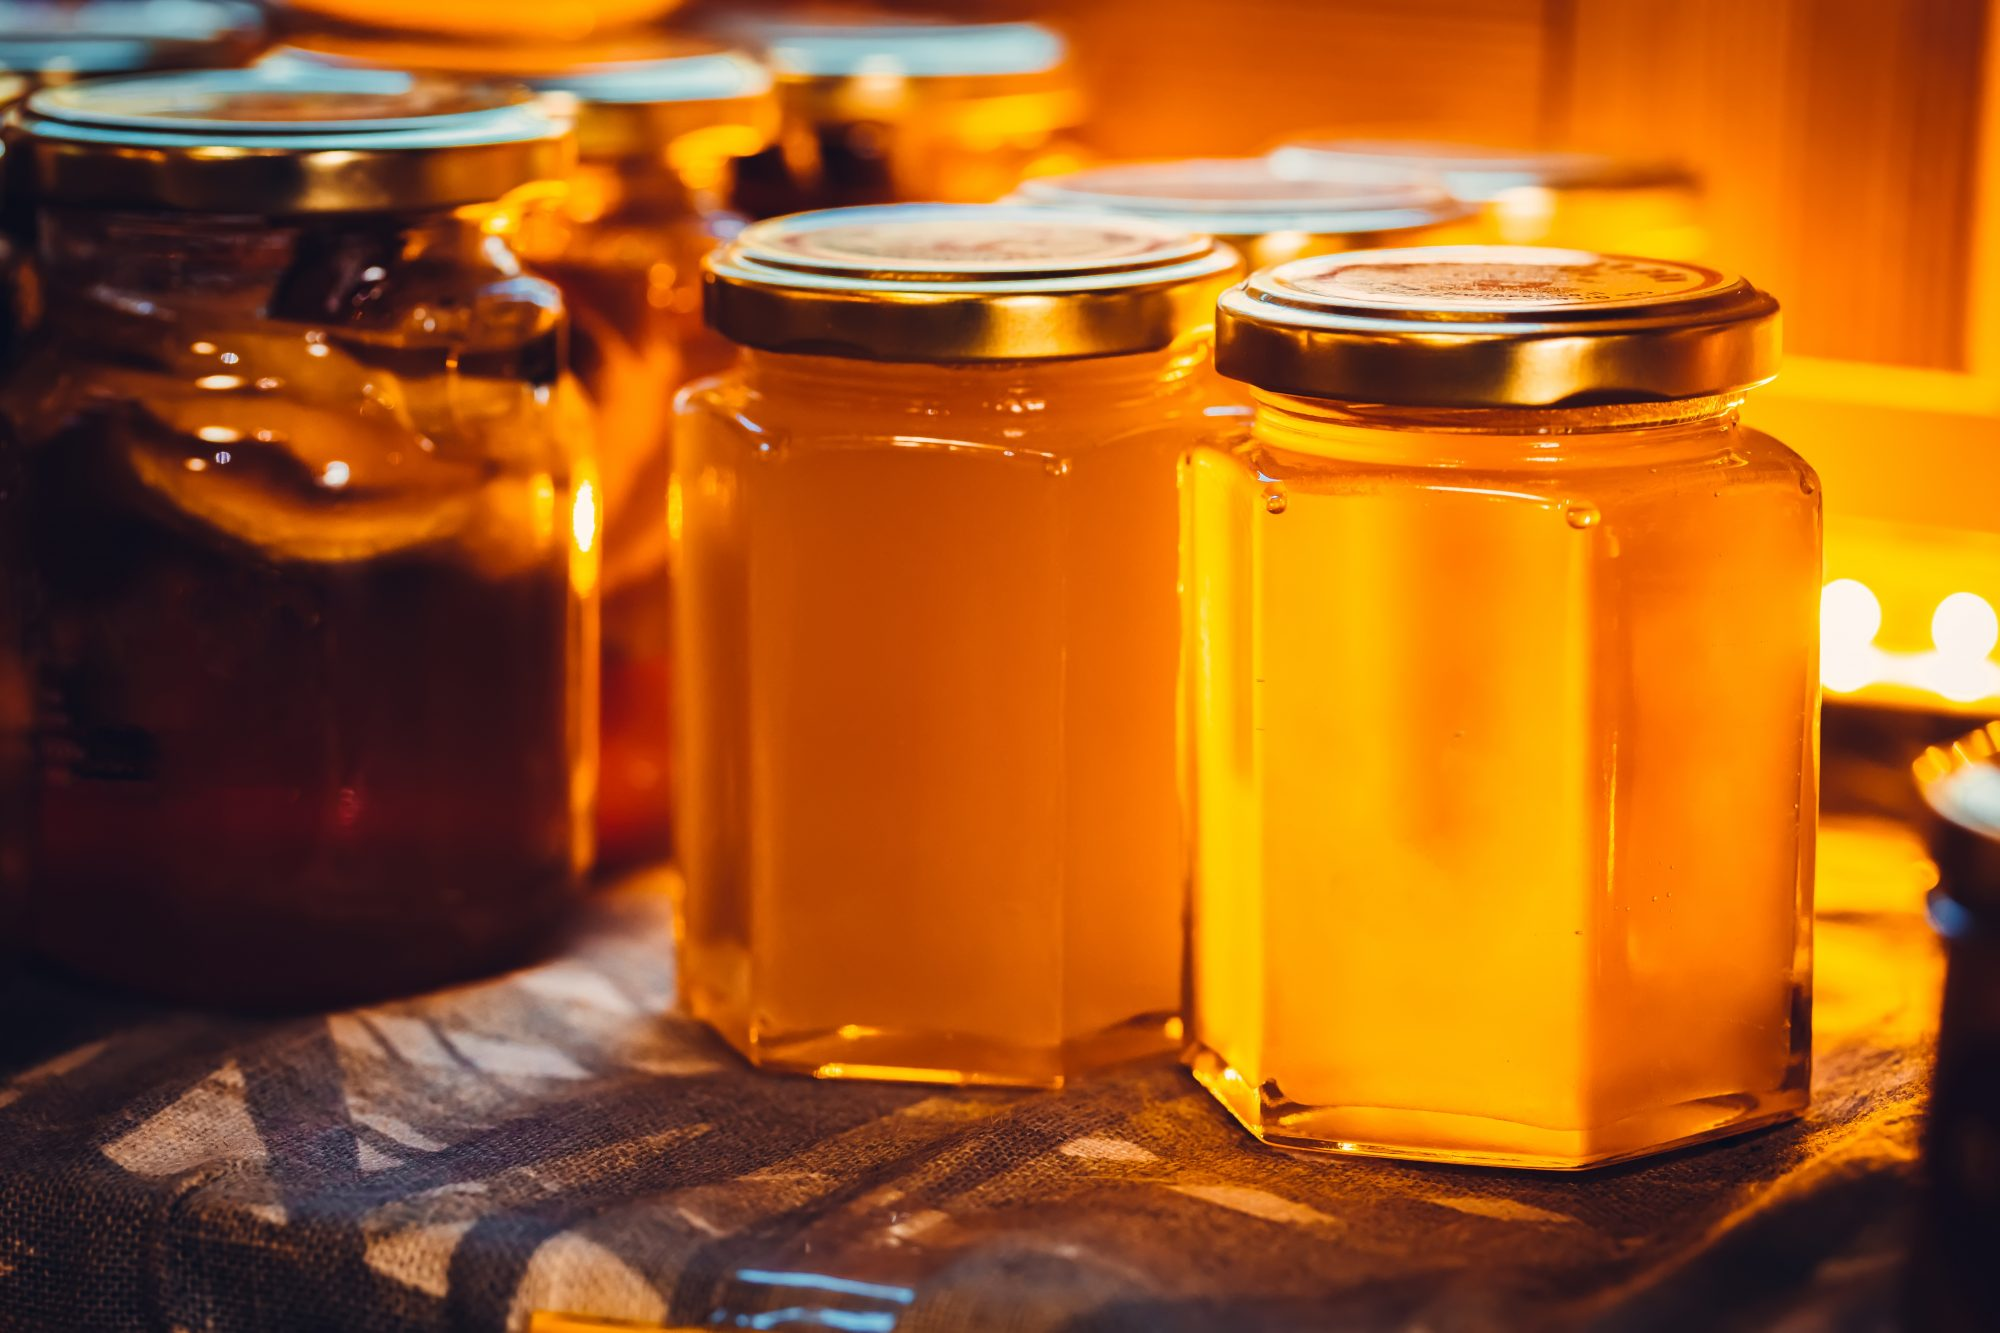 Honey jars Getty 9/21/20